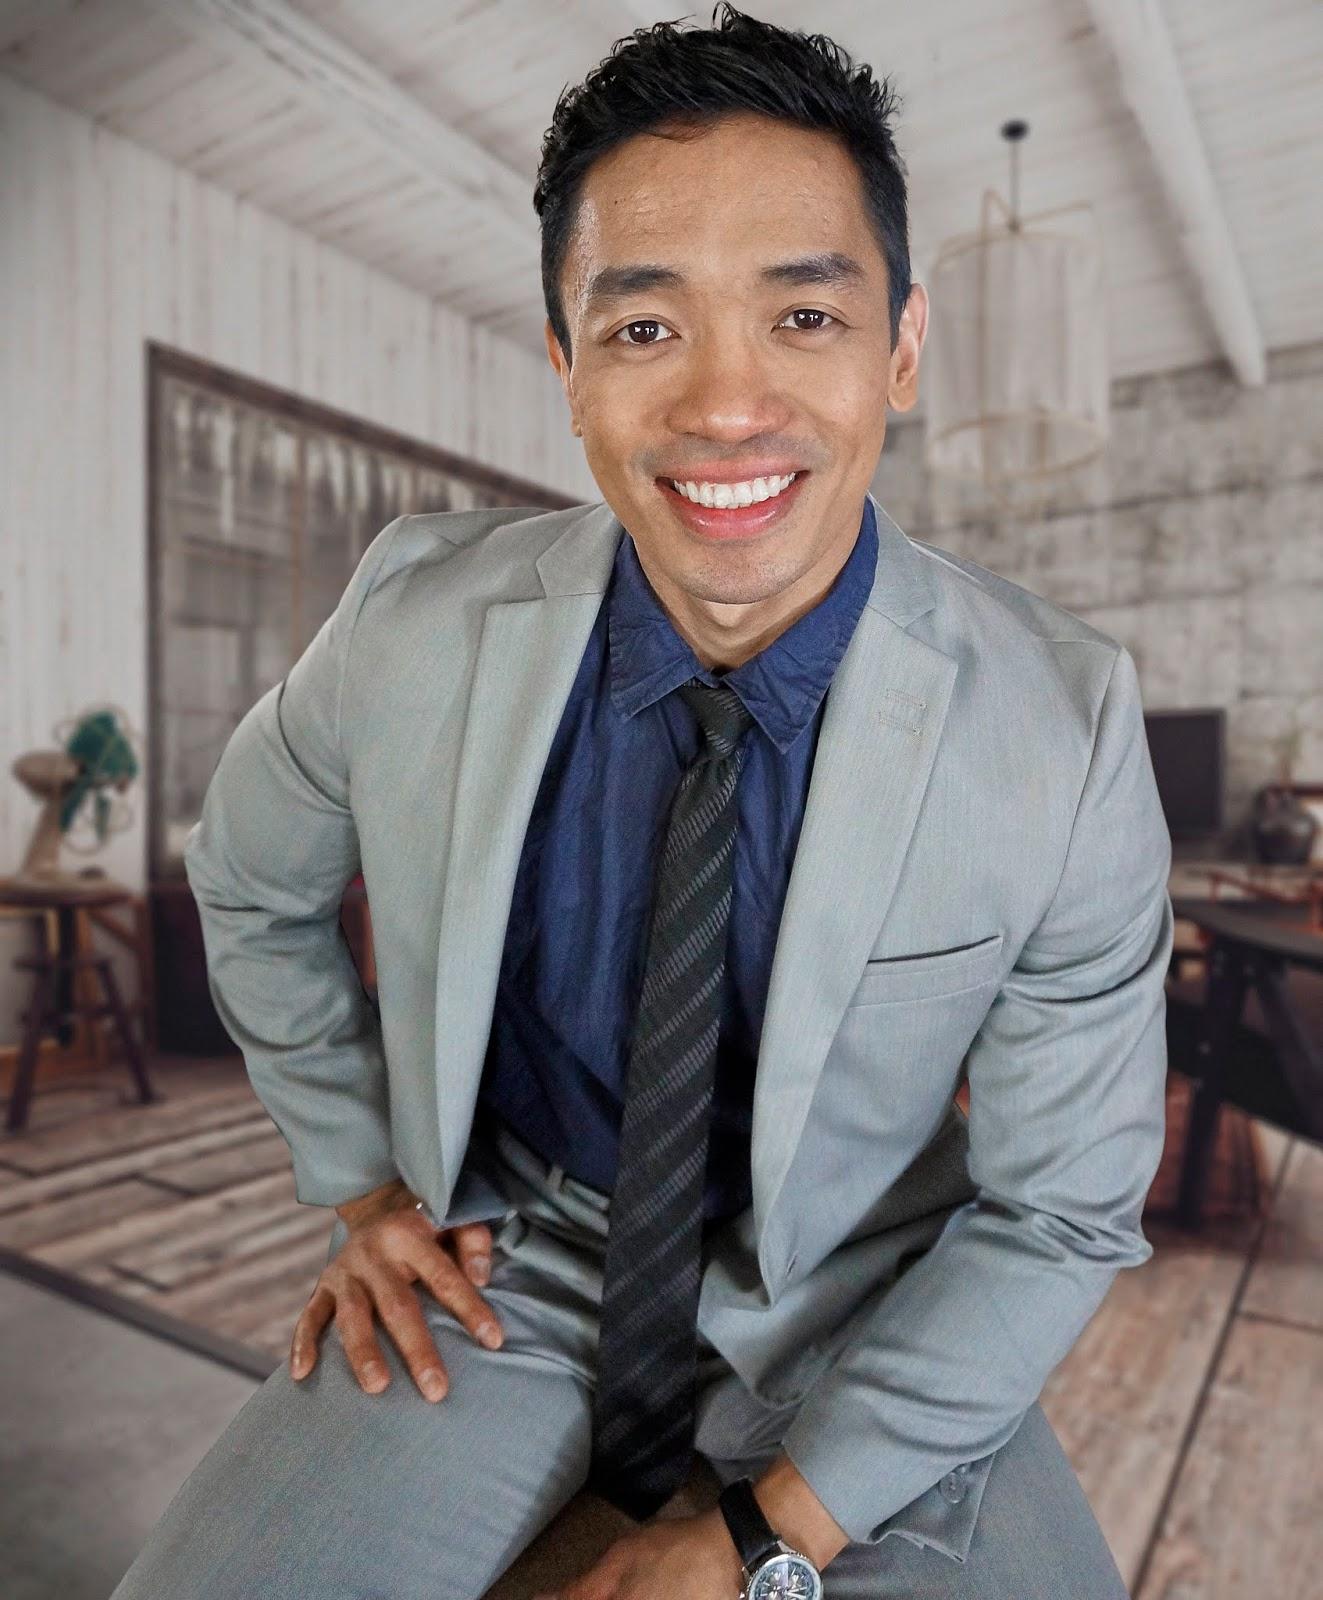 Rone John in gray suit